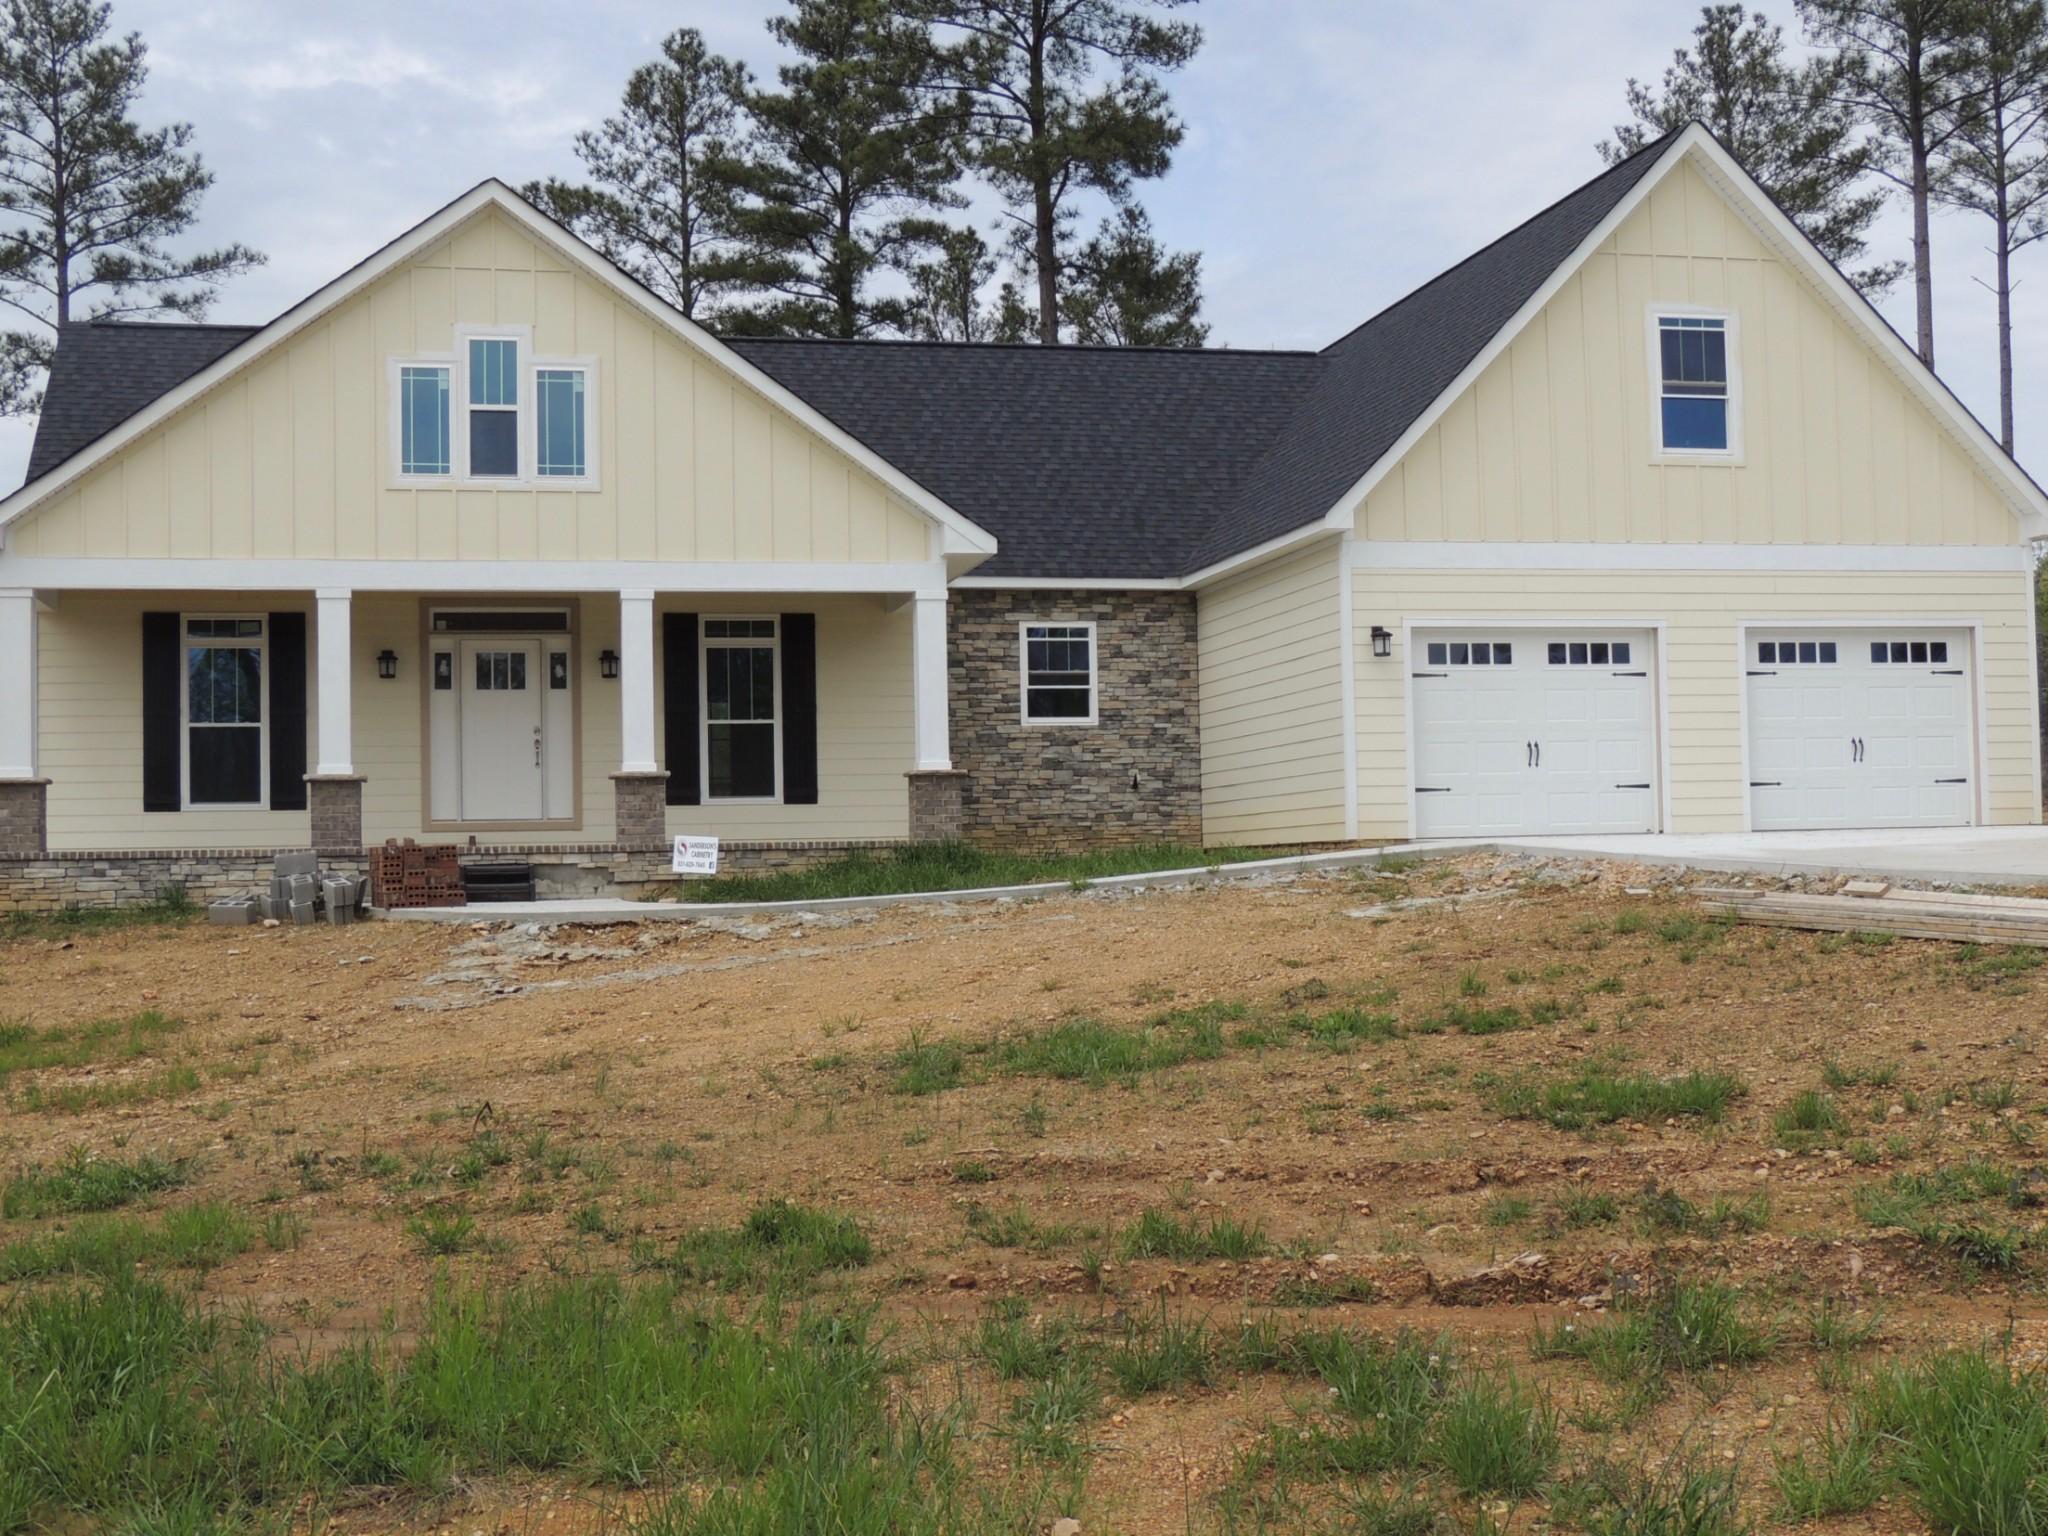 146 Eagle Ridge, Summertown, TN 38483 - Summertown, TN real estate listing